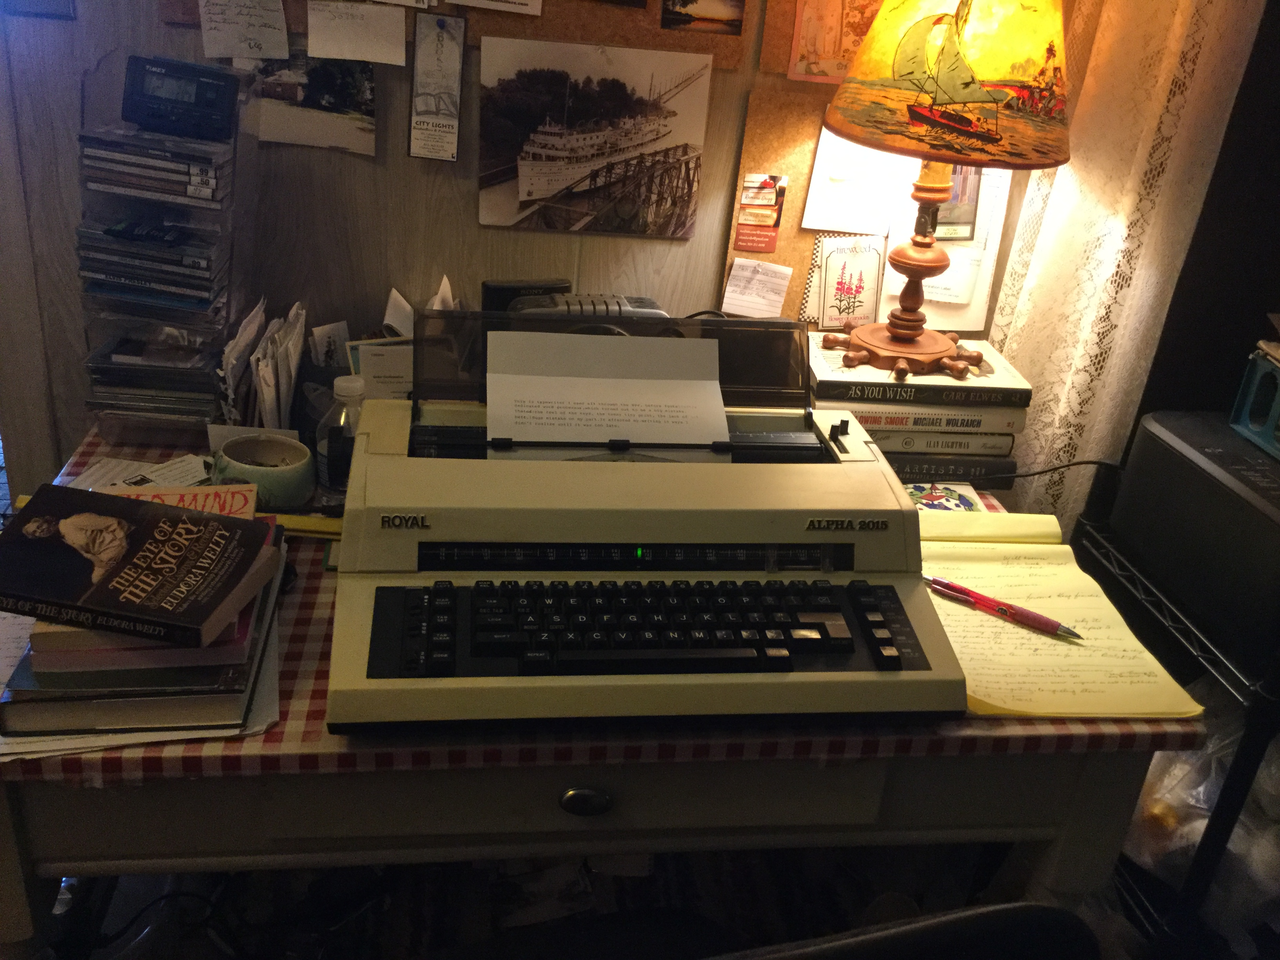 Writer Everlasting